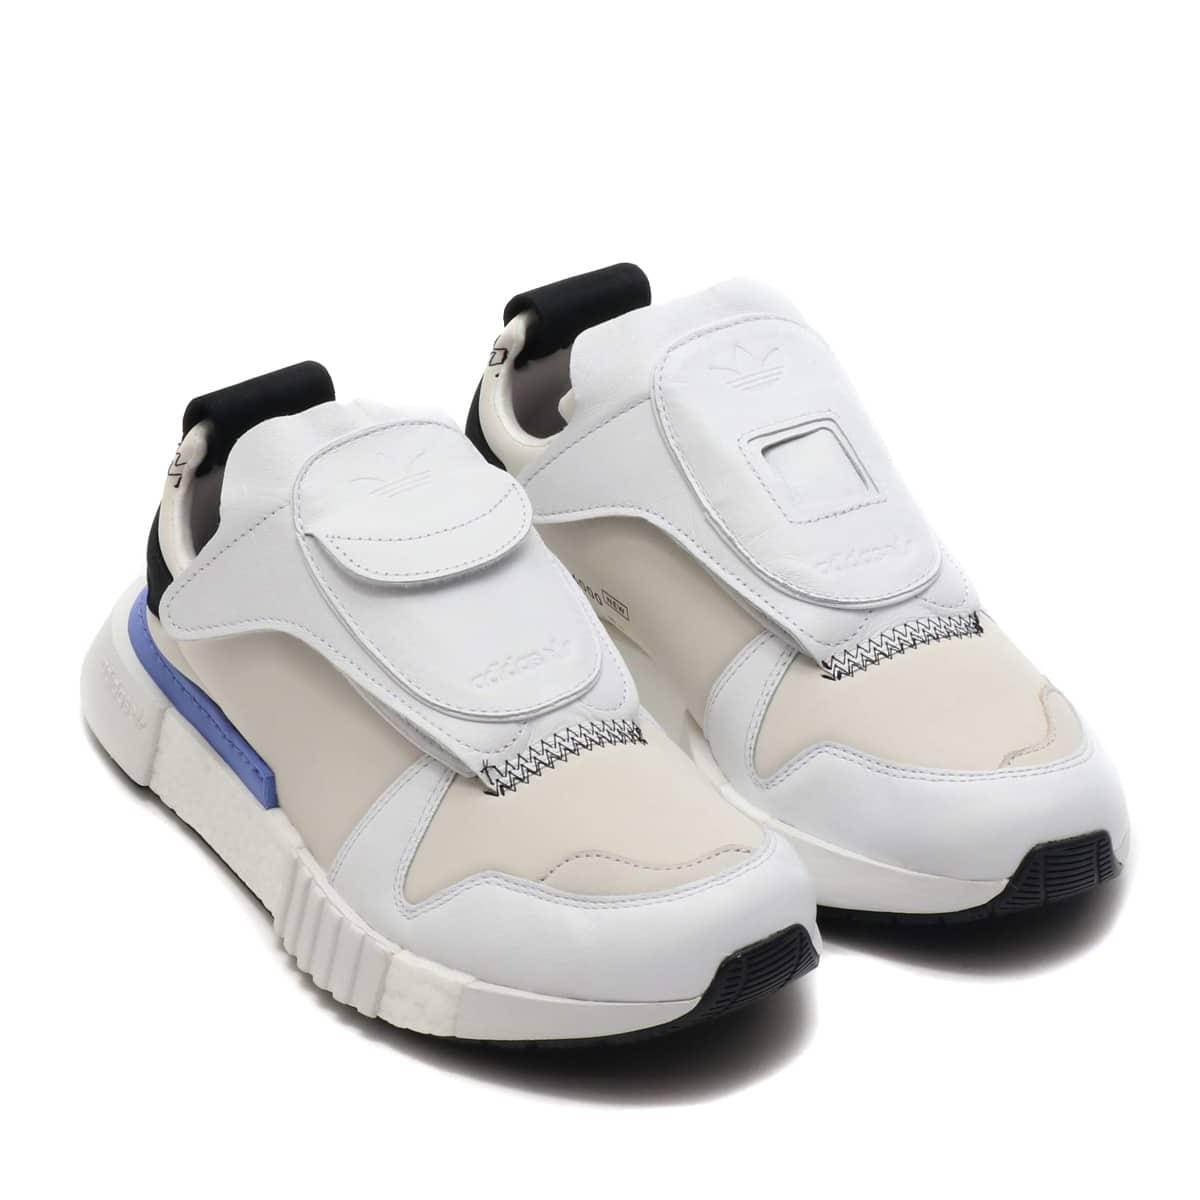 adidas Originals FUTUREPACER  GREY/RUNNING WHITE/CORE BLACK_photo_large